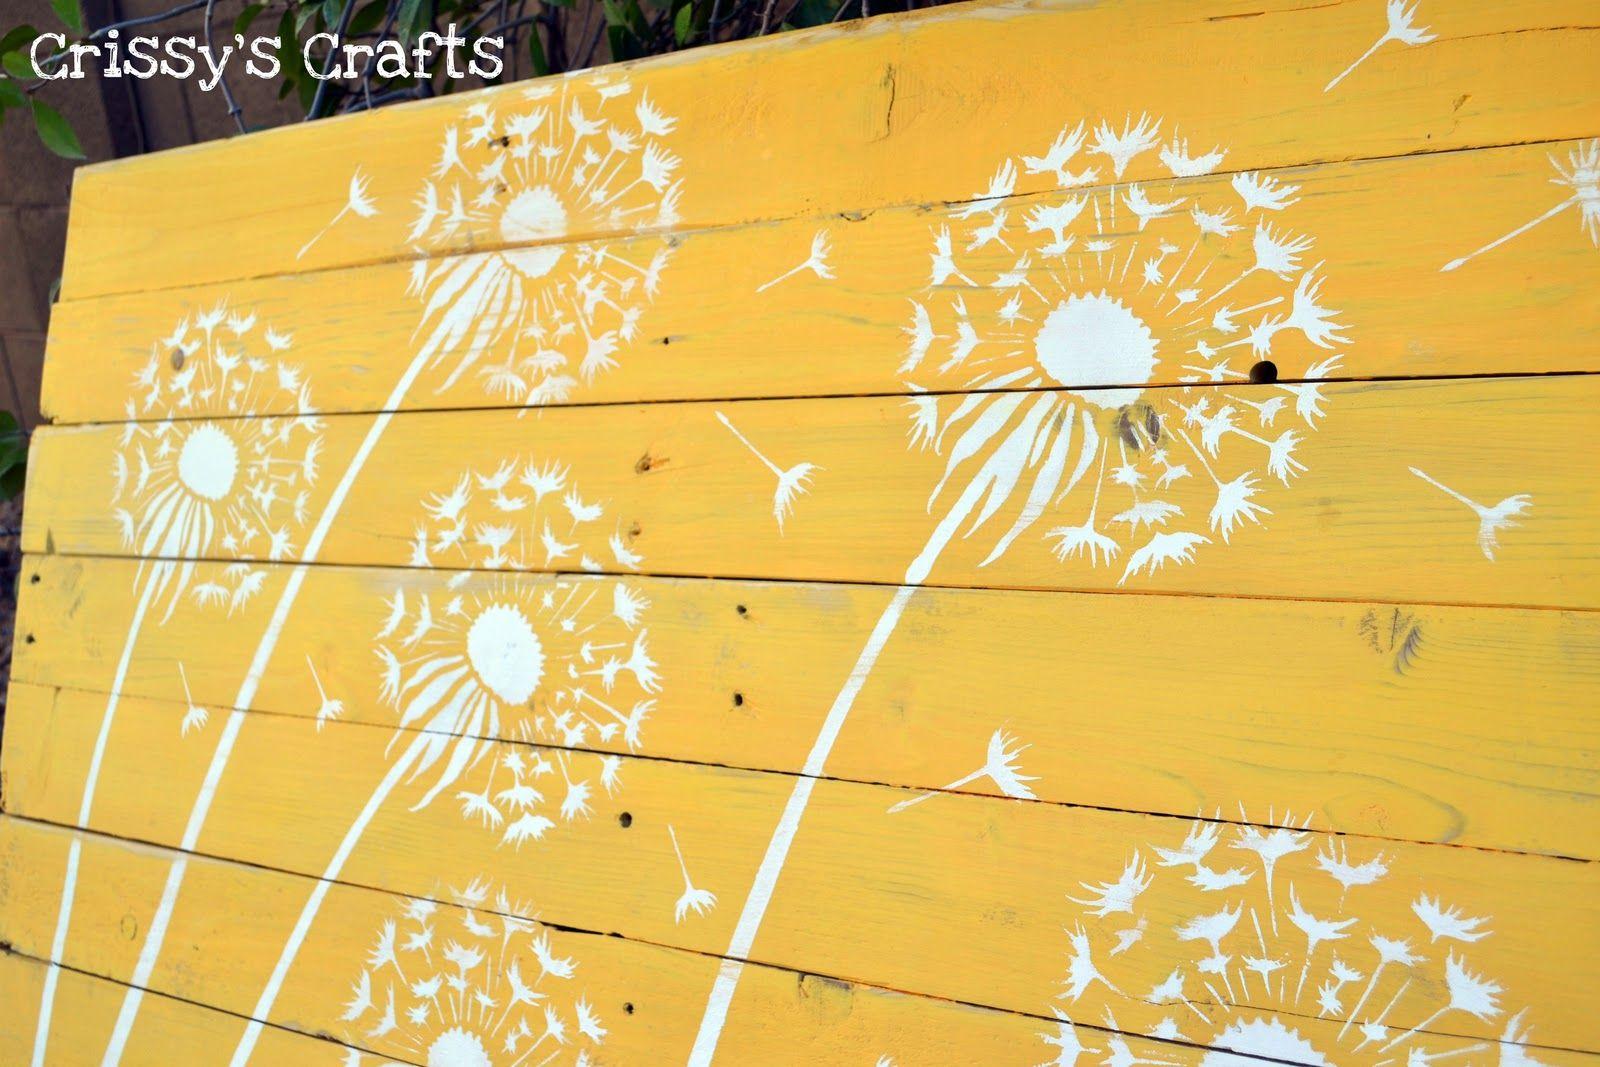 Pallet Dandelions Wall Decor | DIY Wall Art | Pinterest | Dandelions ...